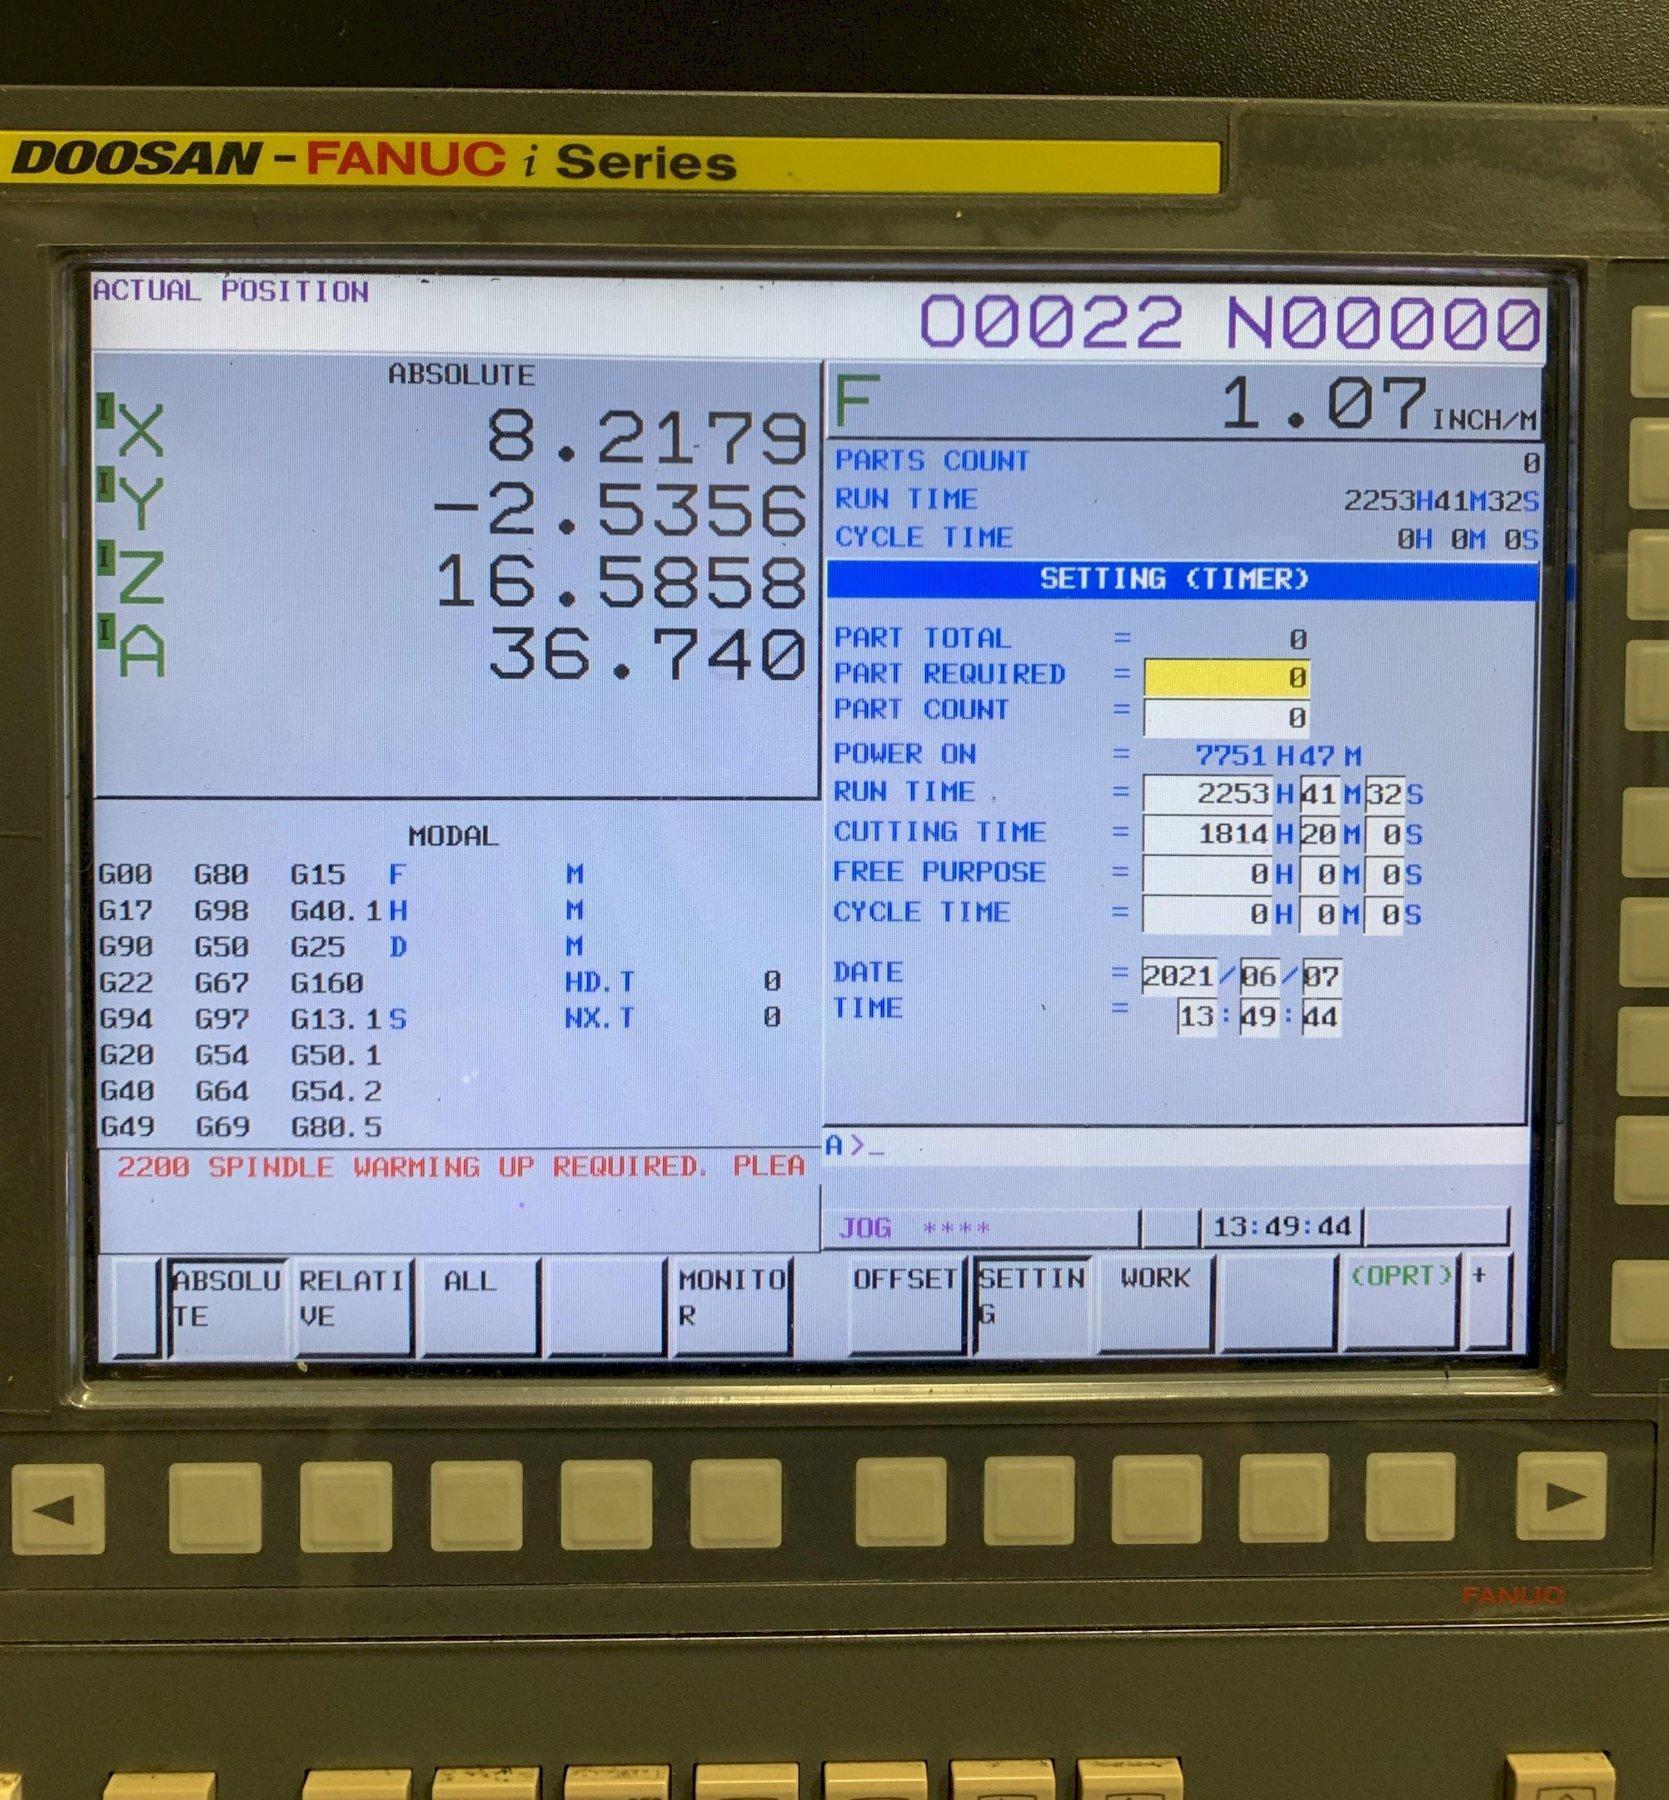 2018 Doosan DNM 5700 Vertical Machining Center